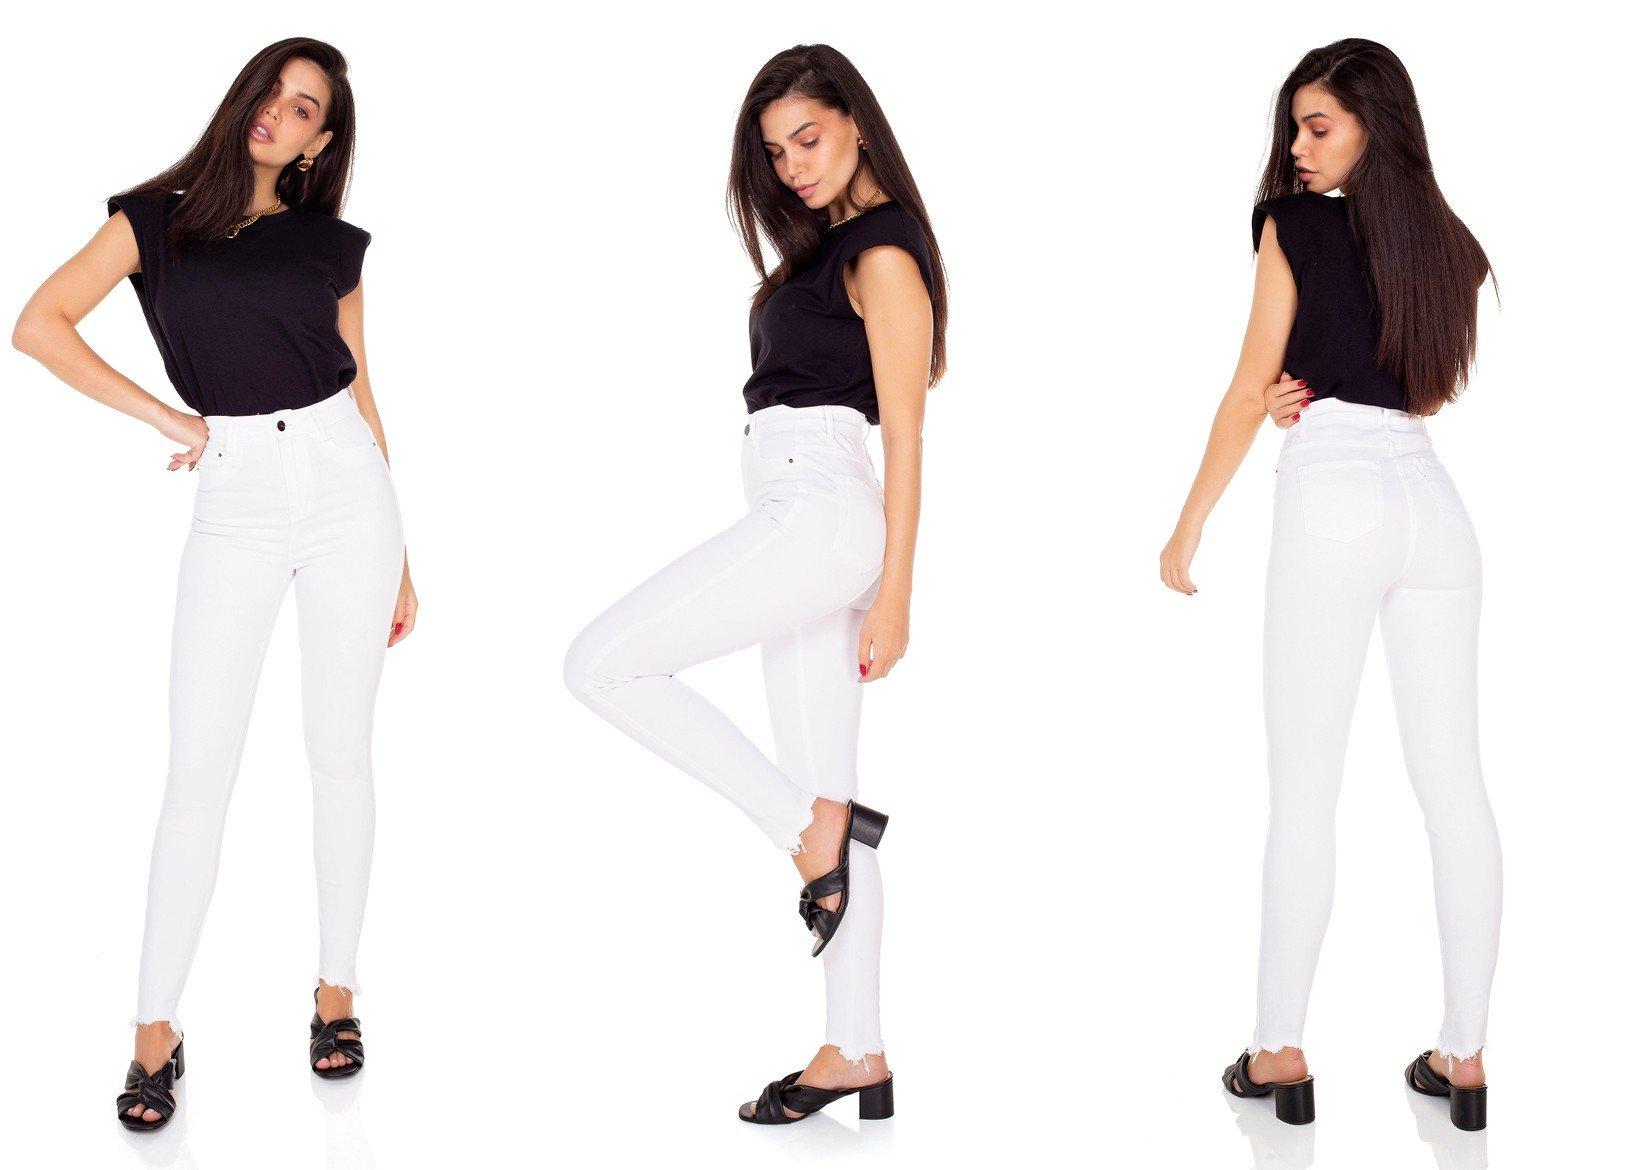 dz3553 calca jeans feminina skinny hot pants barra irregular black and white branca denim zero tripla